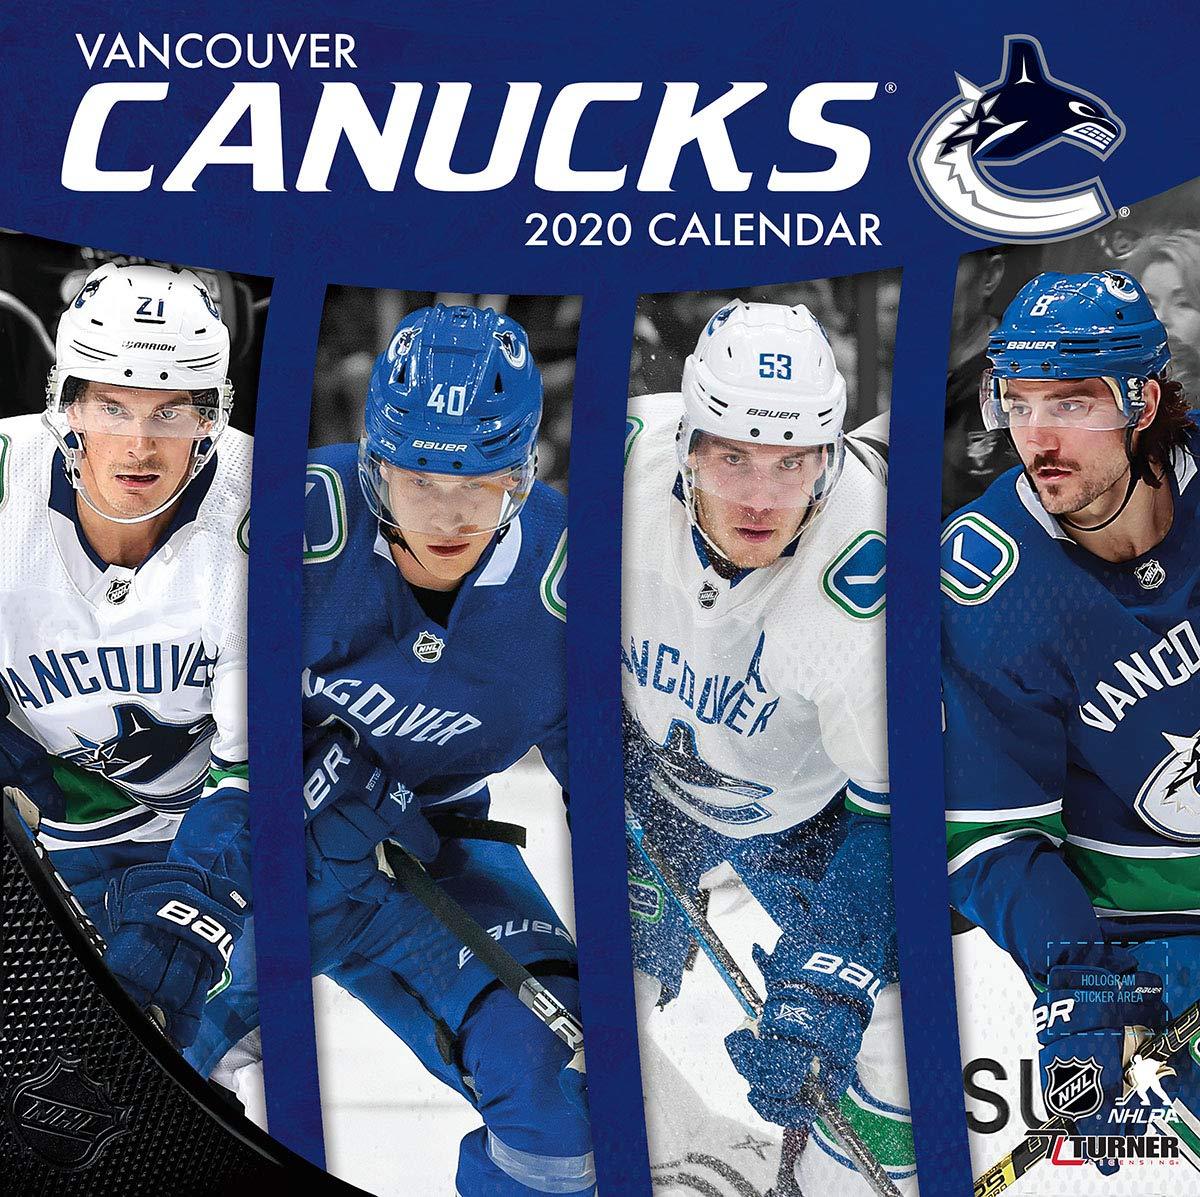 Vancouver Canucks  2020 12x12 Team Wall Calendar